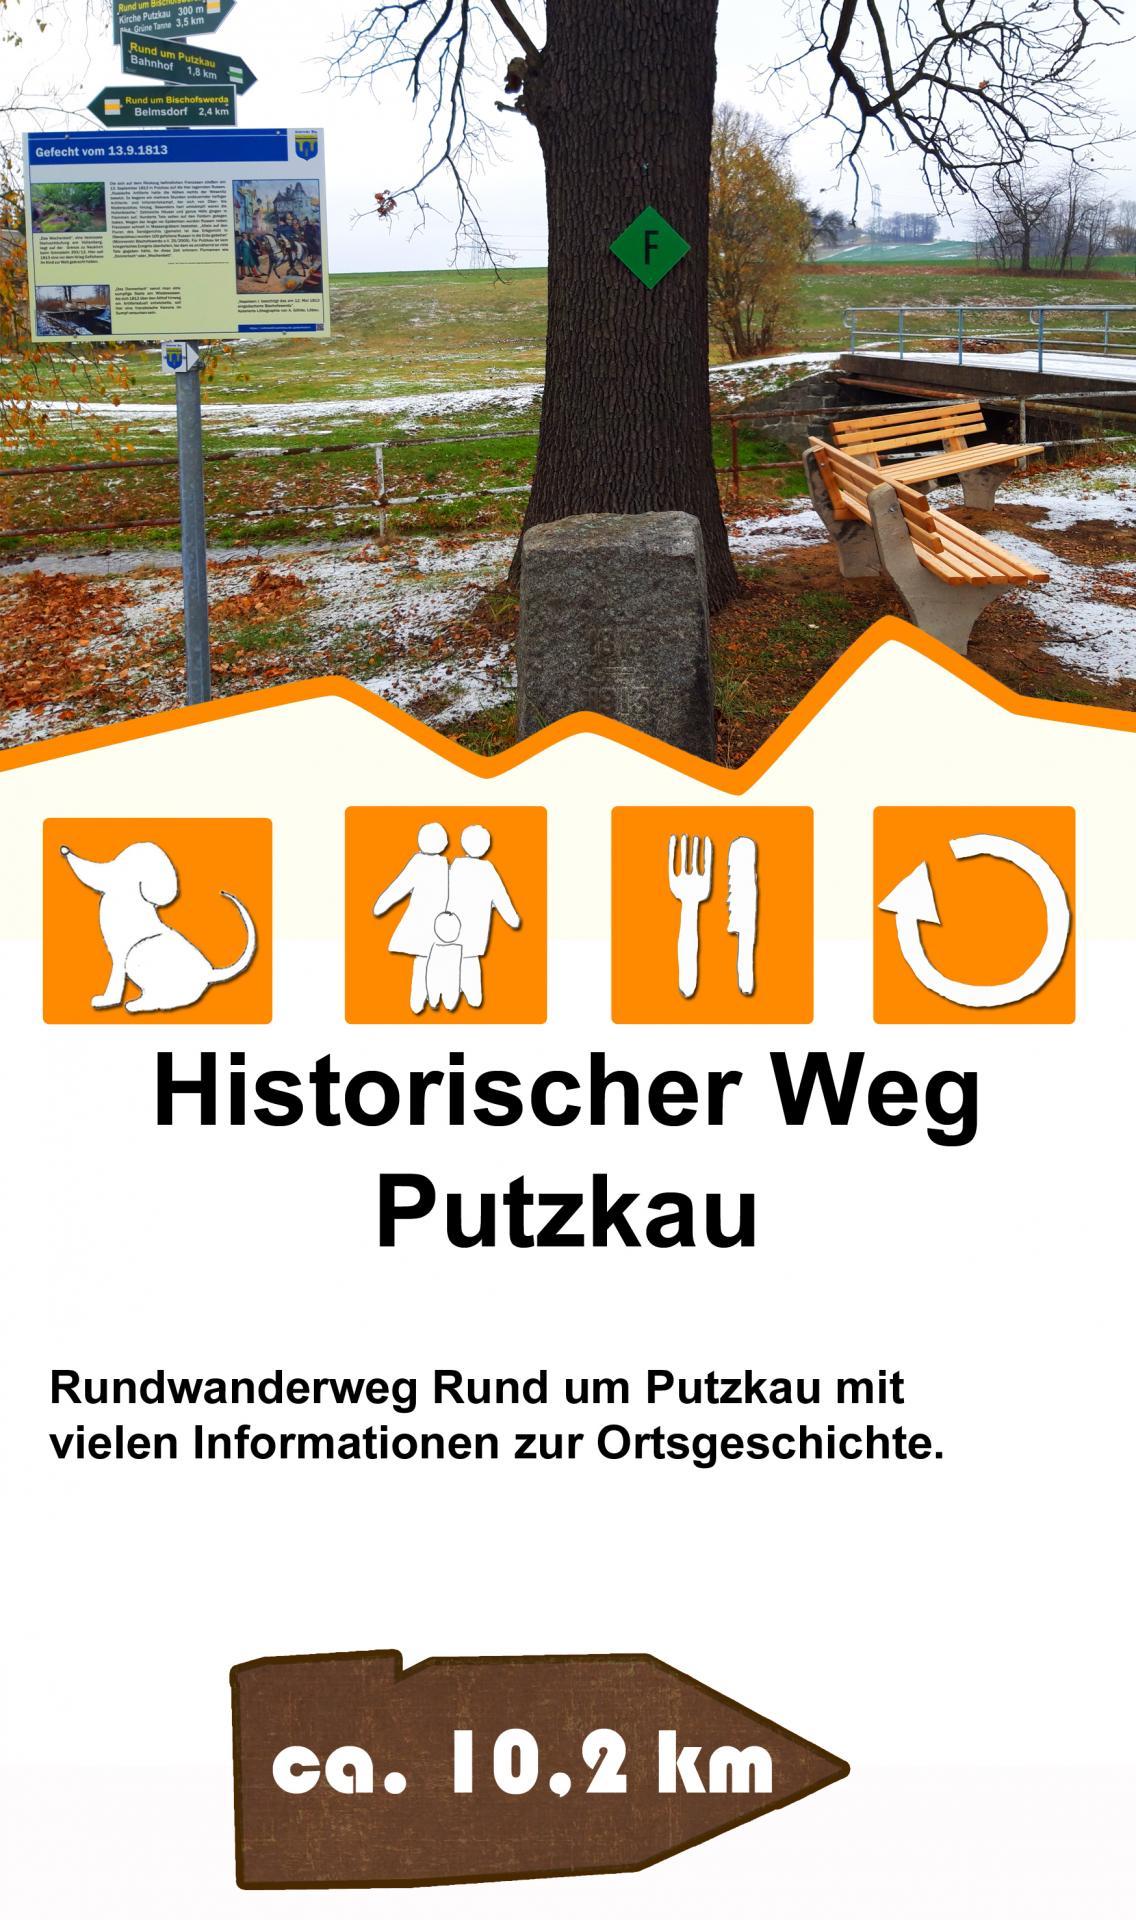 Historischer Weg Putzkau